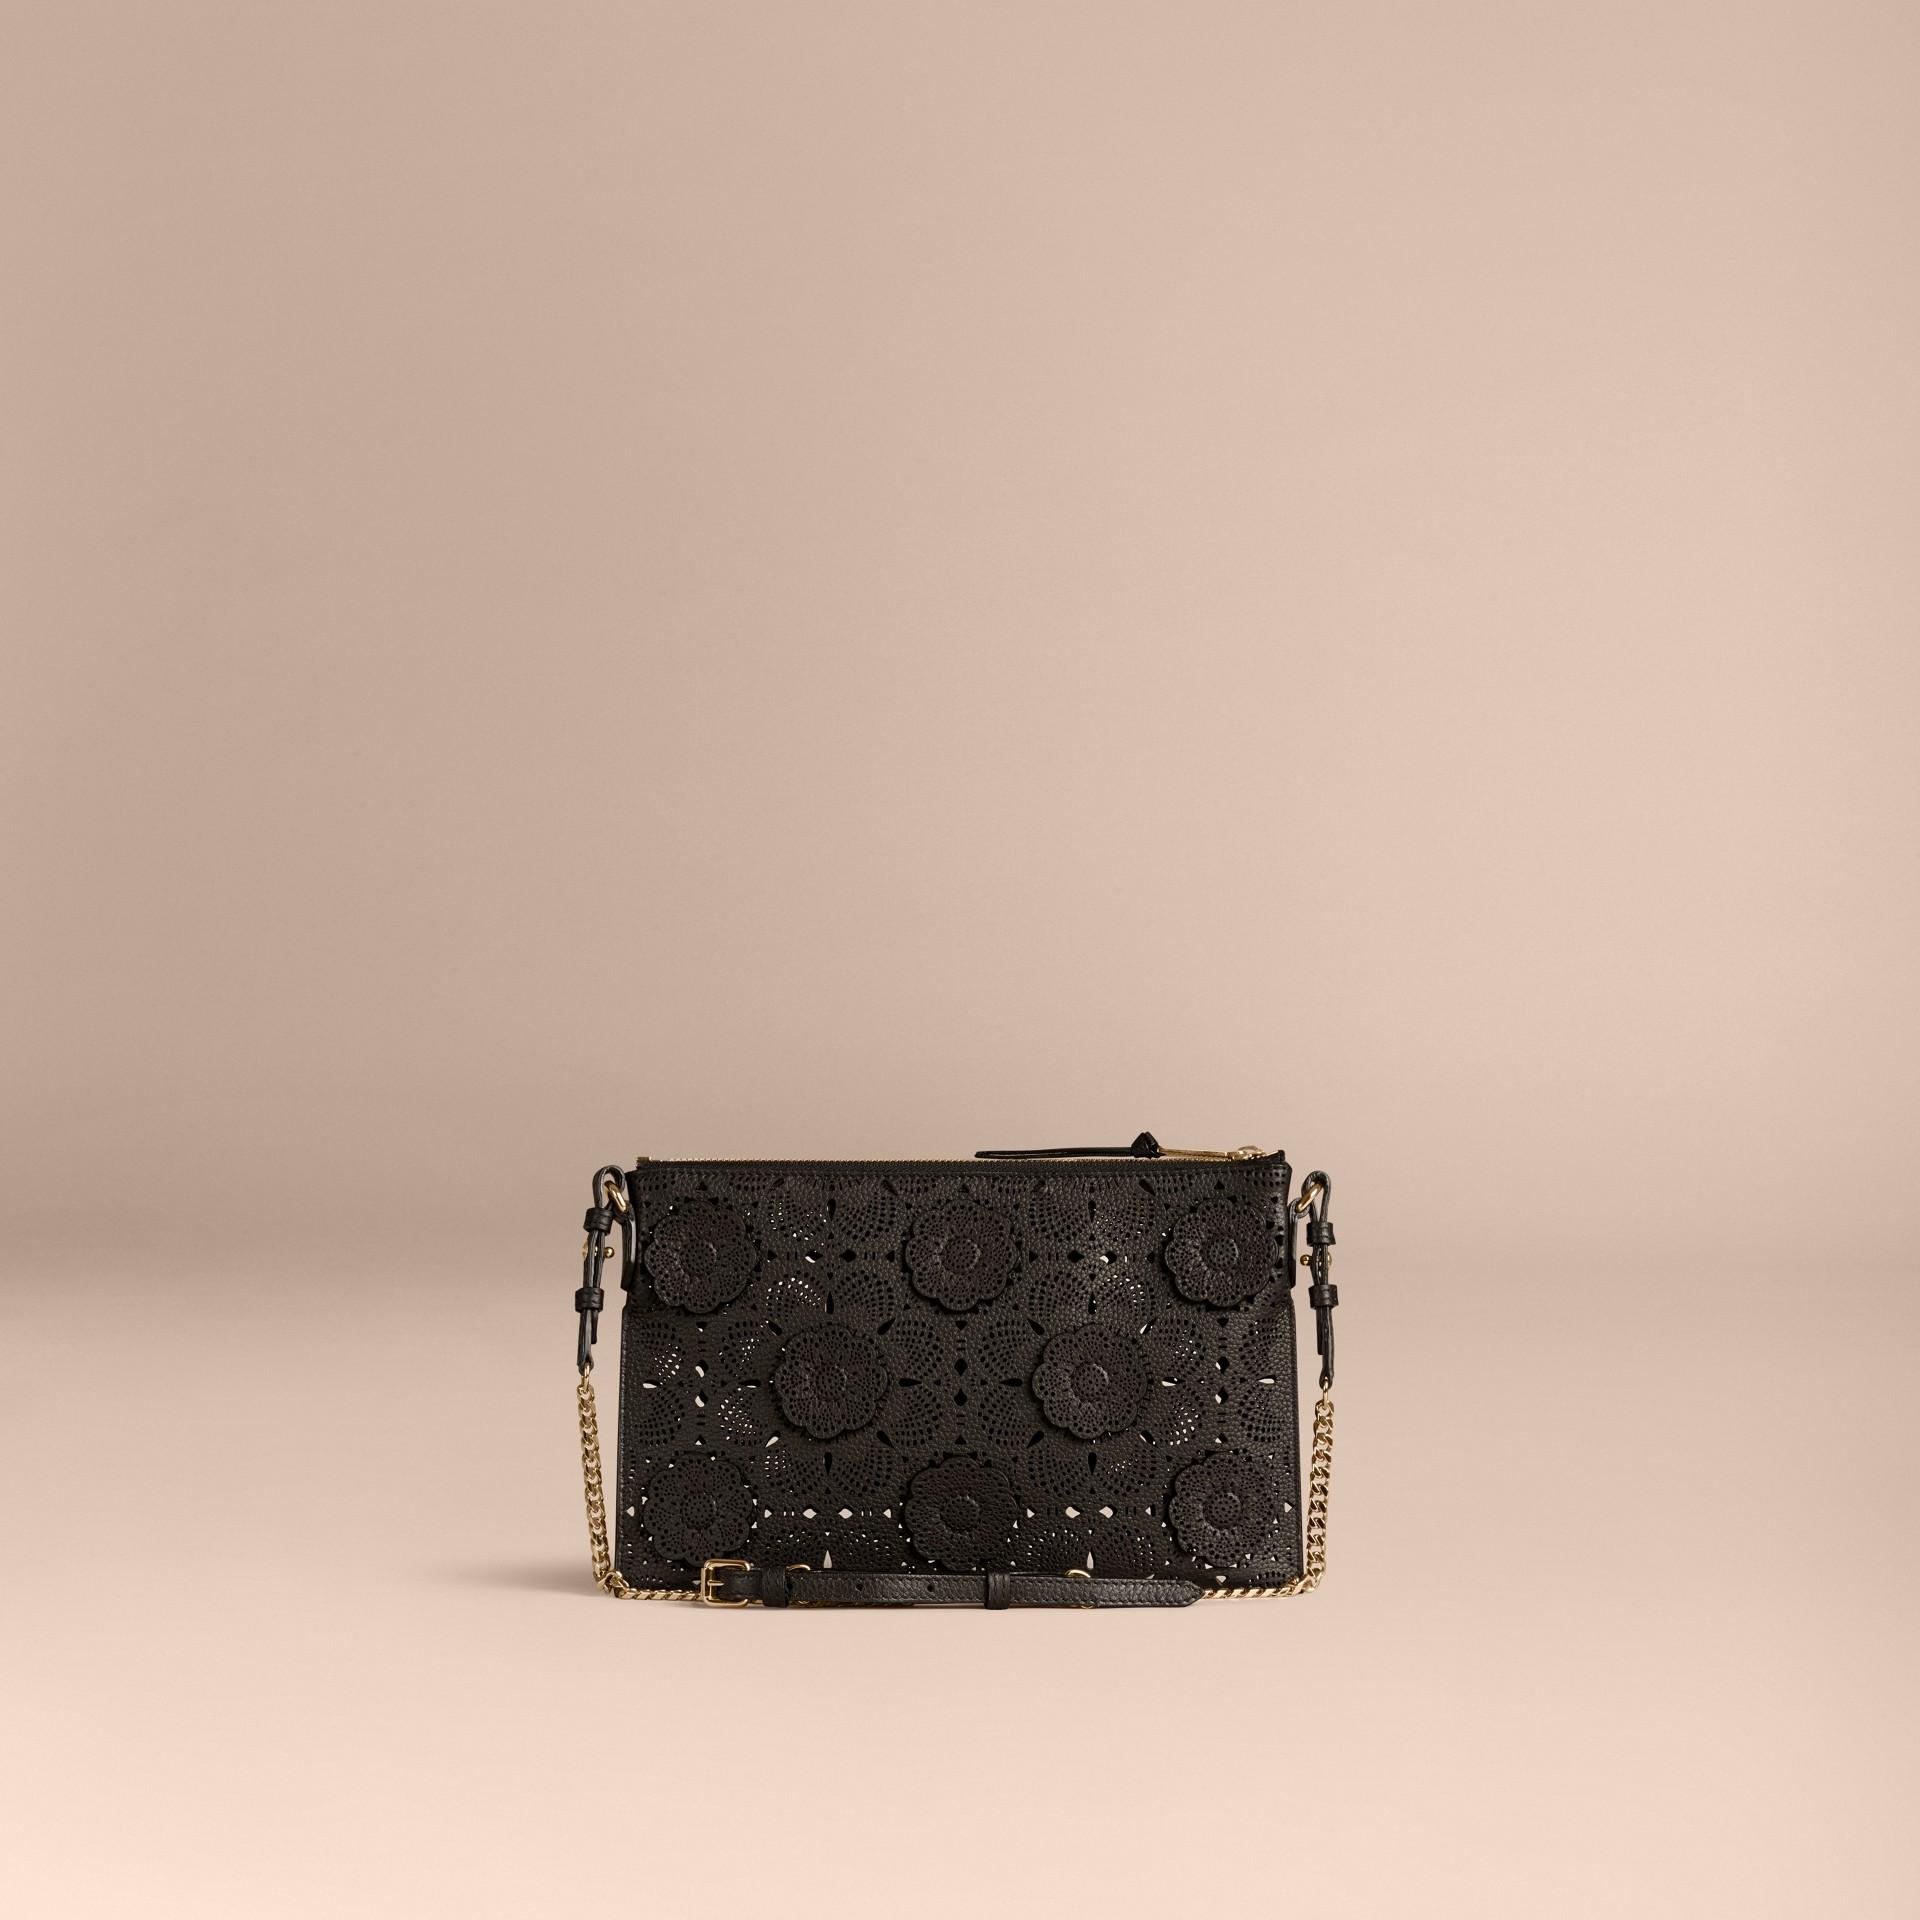 Black Laser-cut Floral Lace Leather Clutch Bag Black - gallery image 3